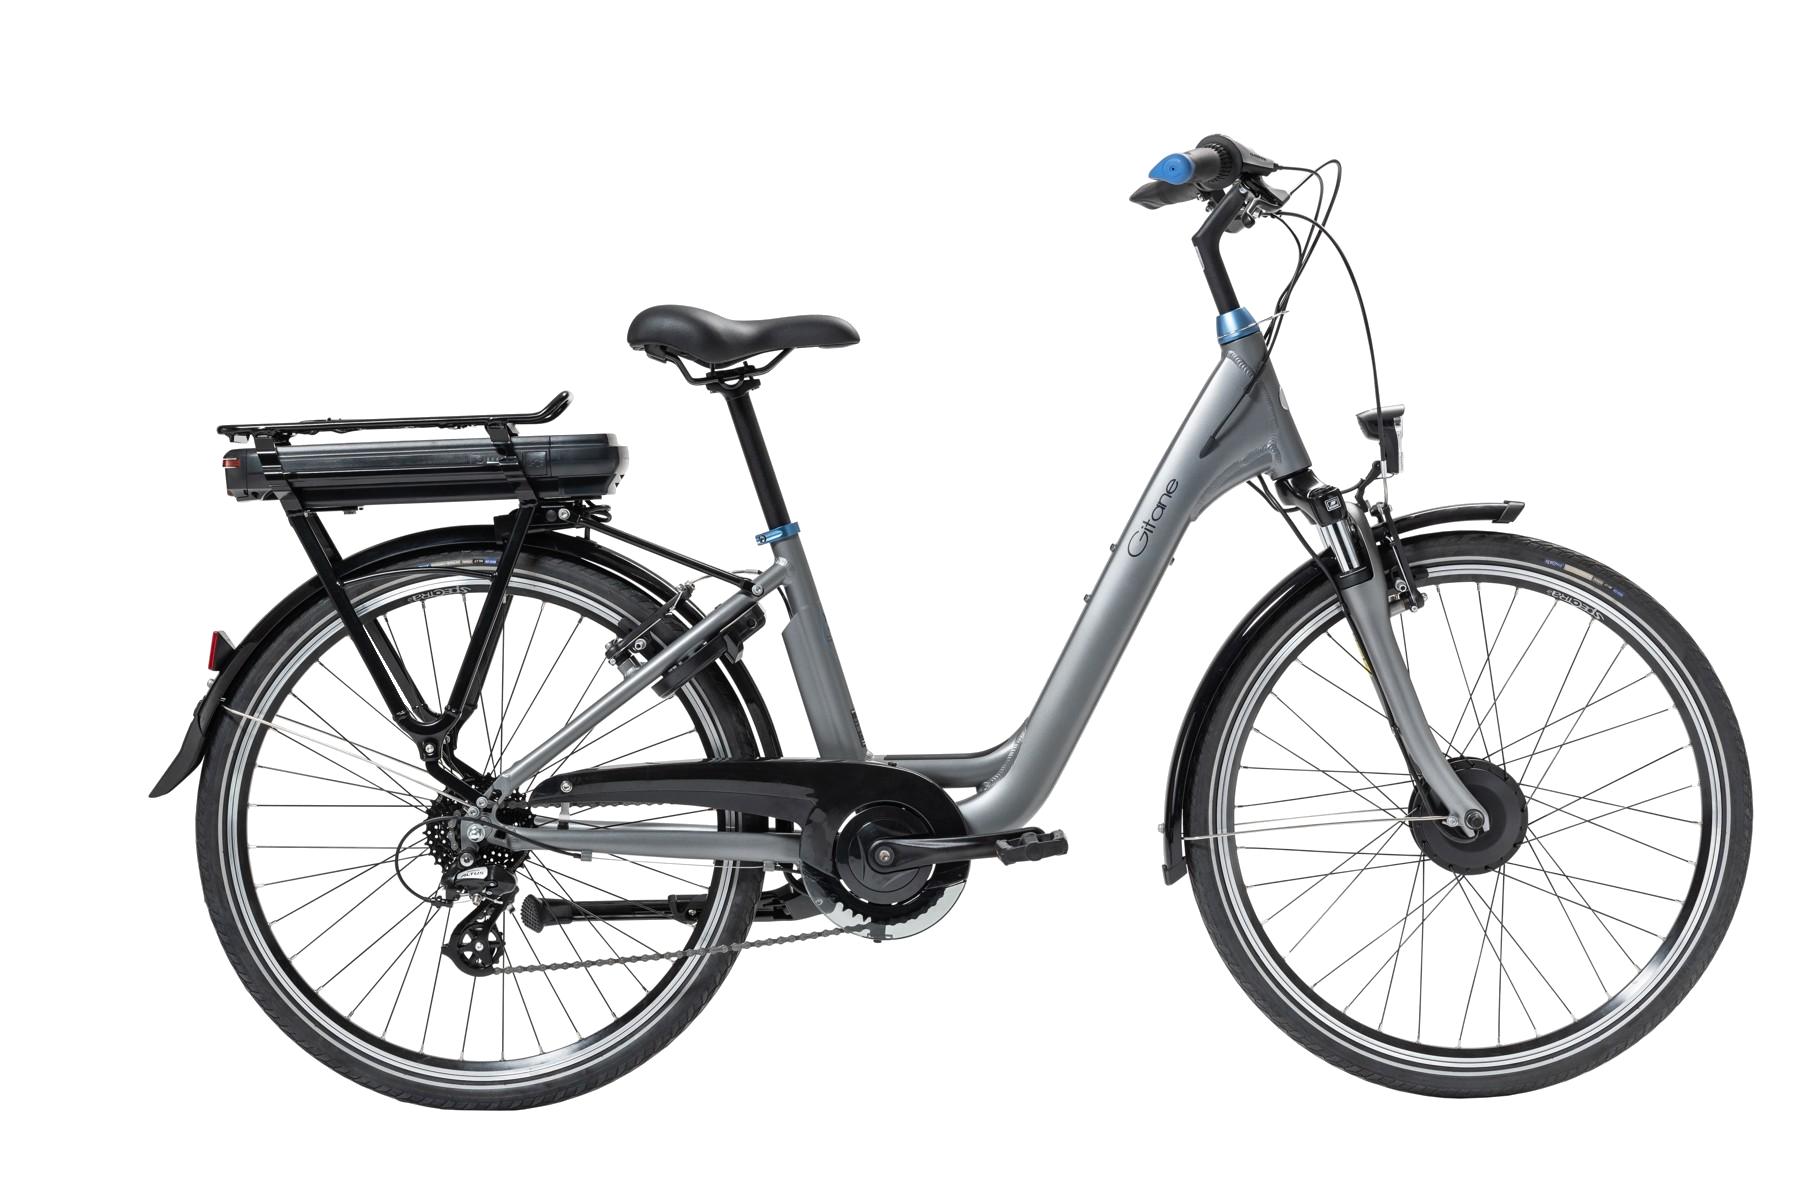 https://w8w5m3f8.stackpathcdn.com/17402/velo-electrique-urbain-organ-e-bike-400wh.jpg